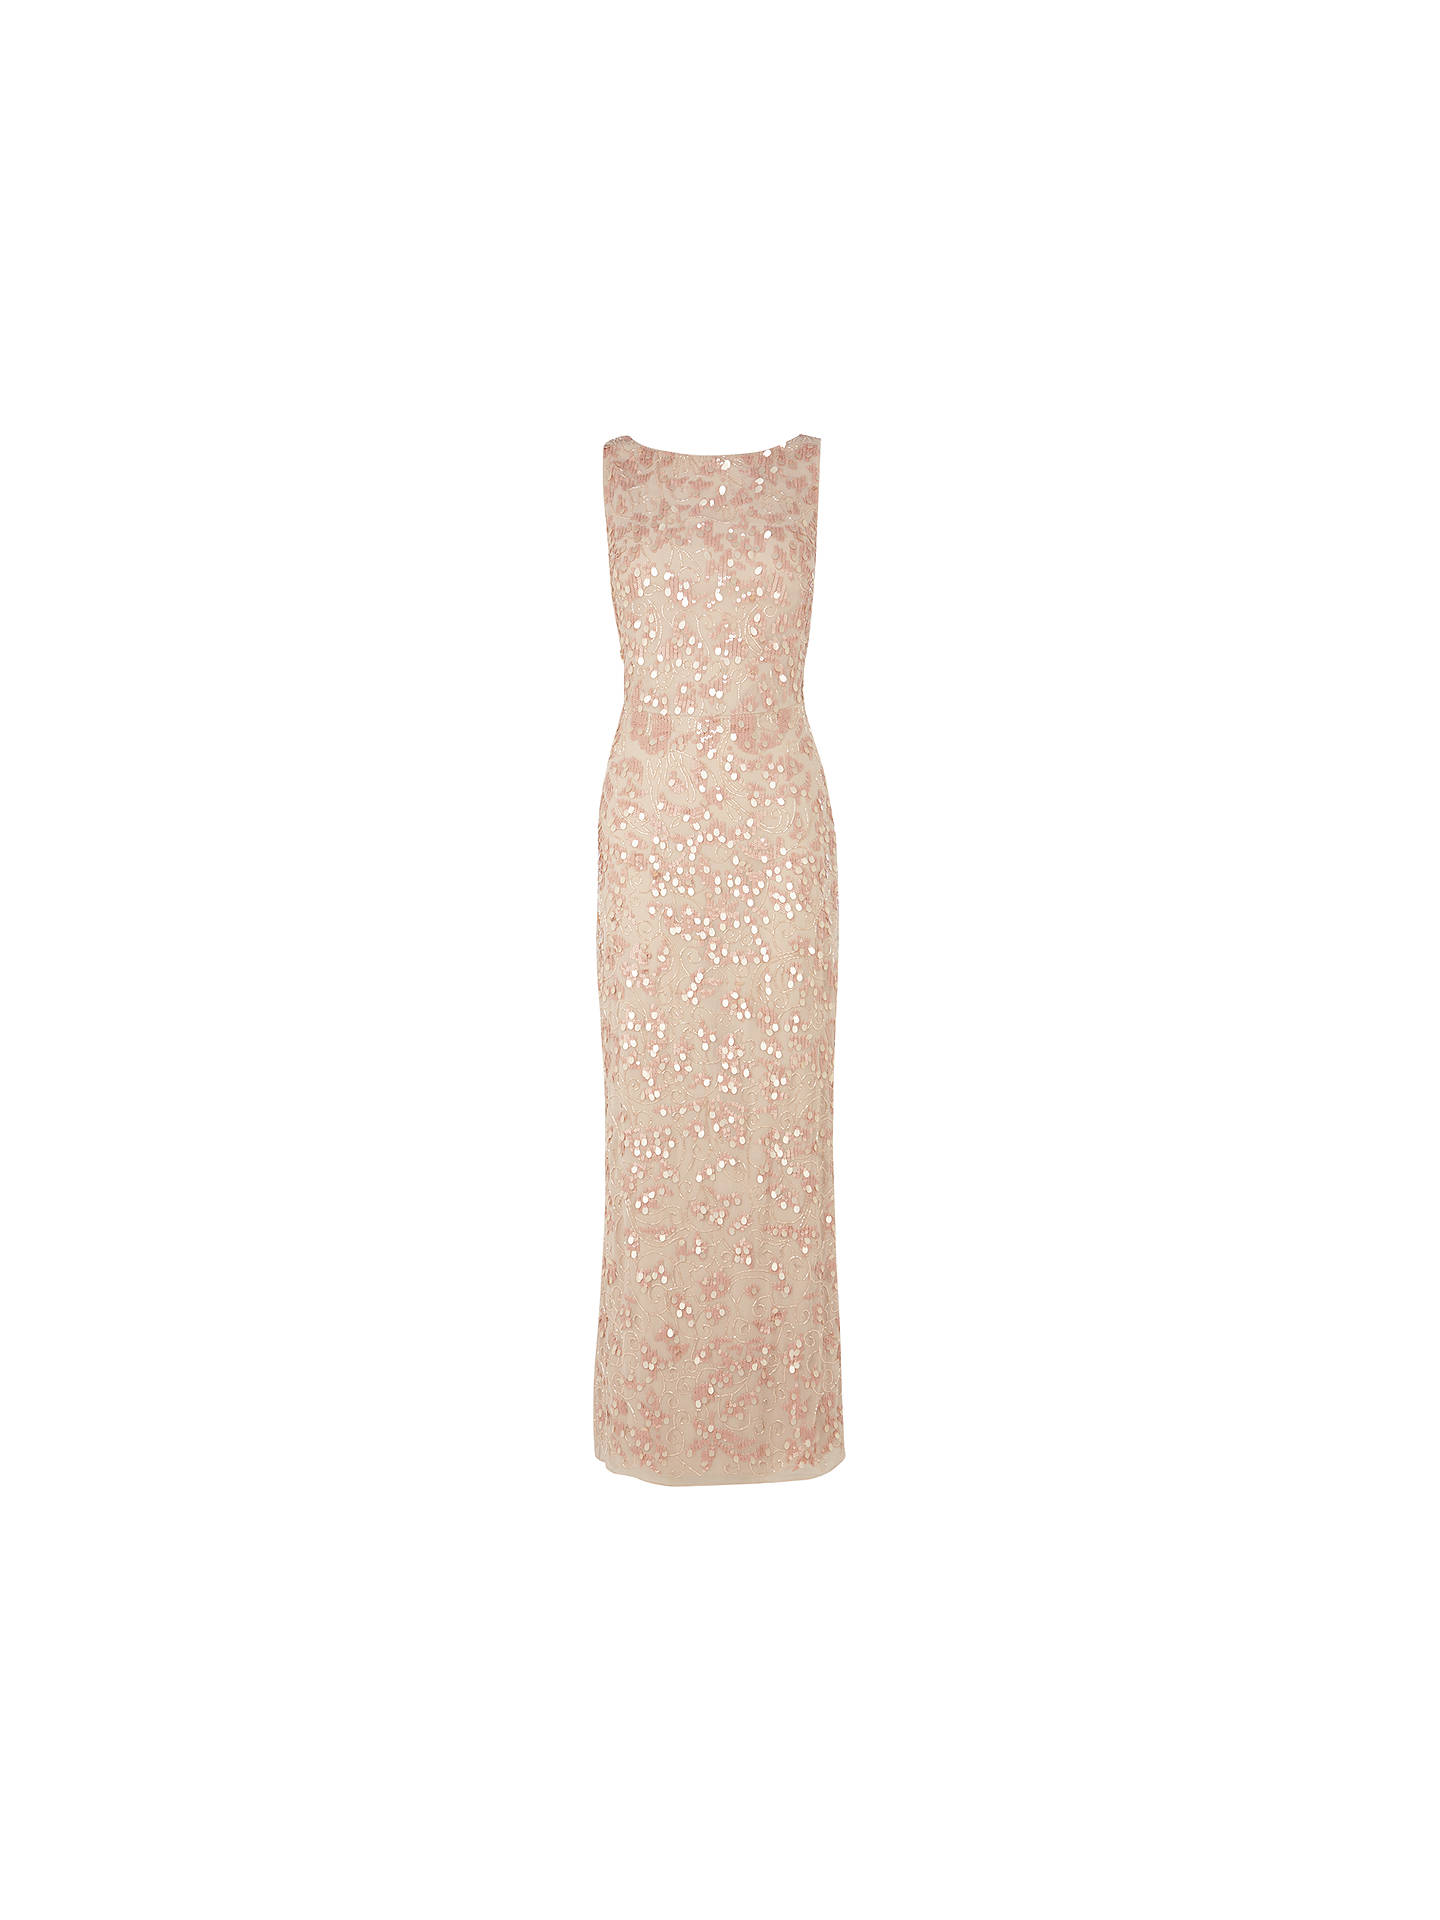 638a6c44 Buy Coast Felix Sequin Maxi Dress, Blush, 6 Online at johnlewis.com ...